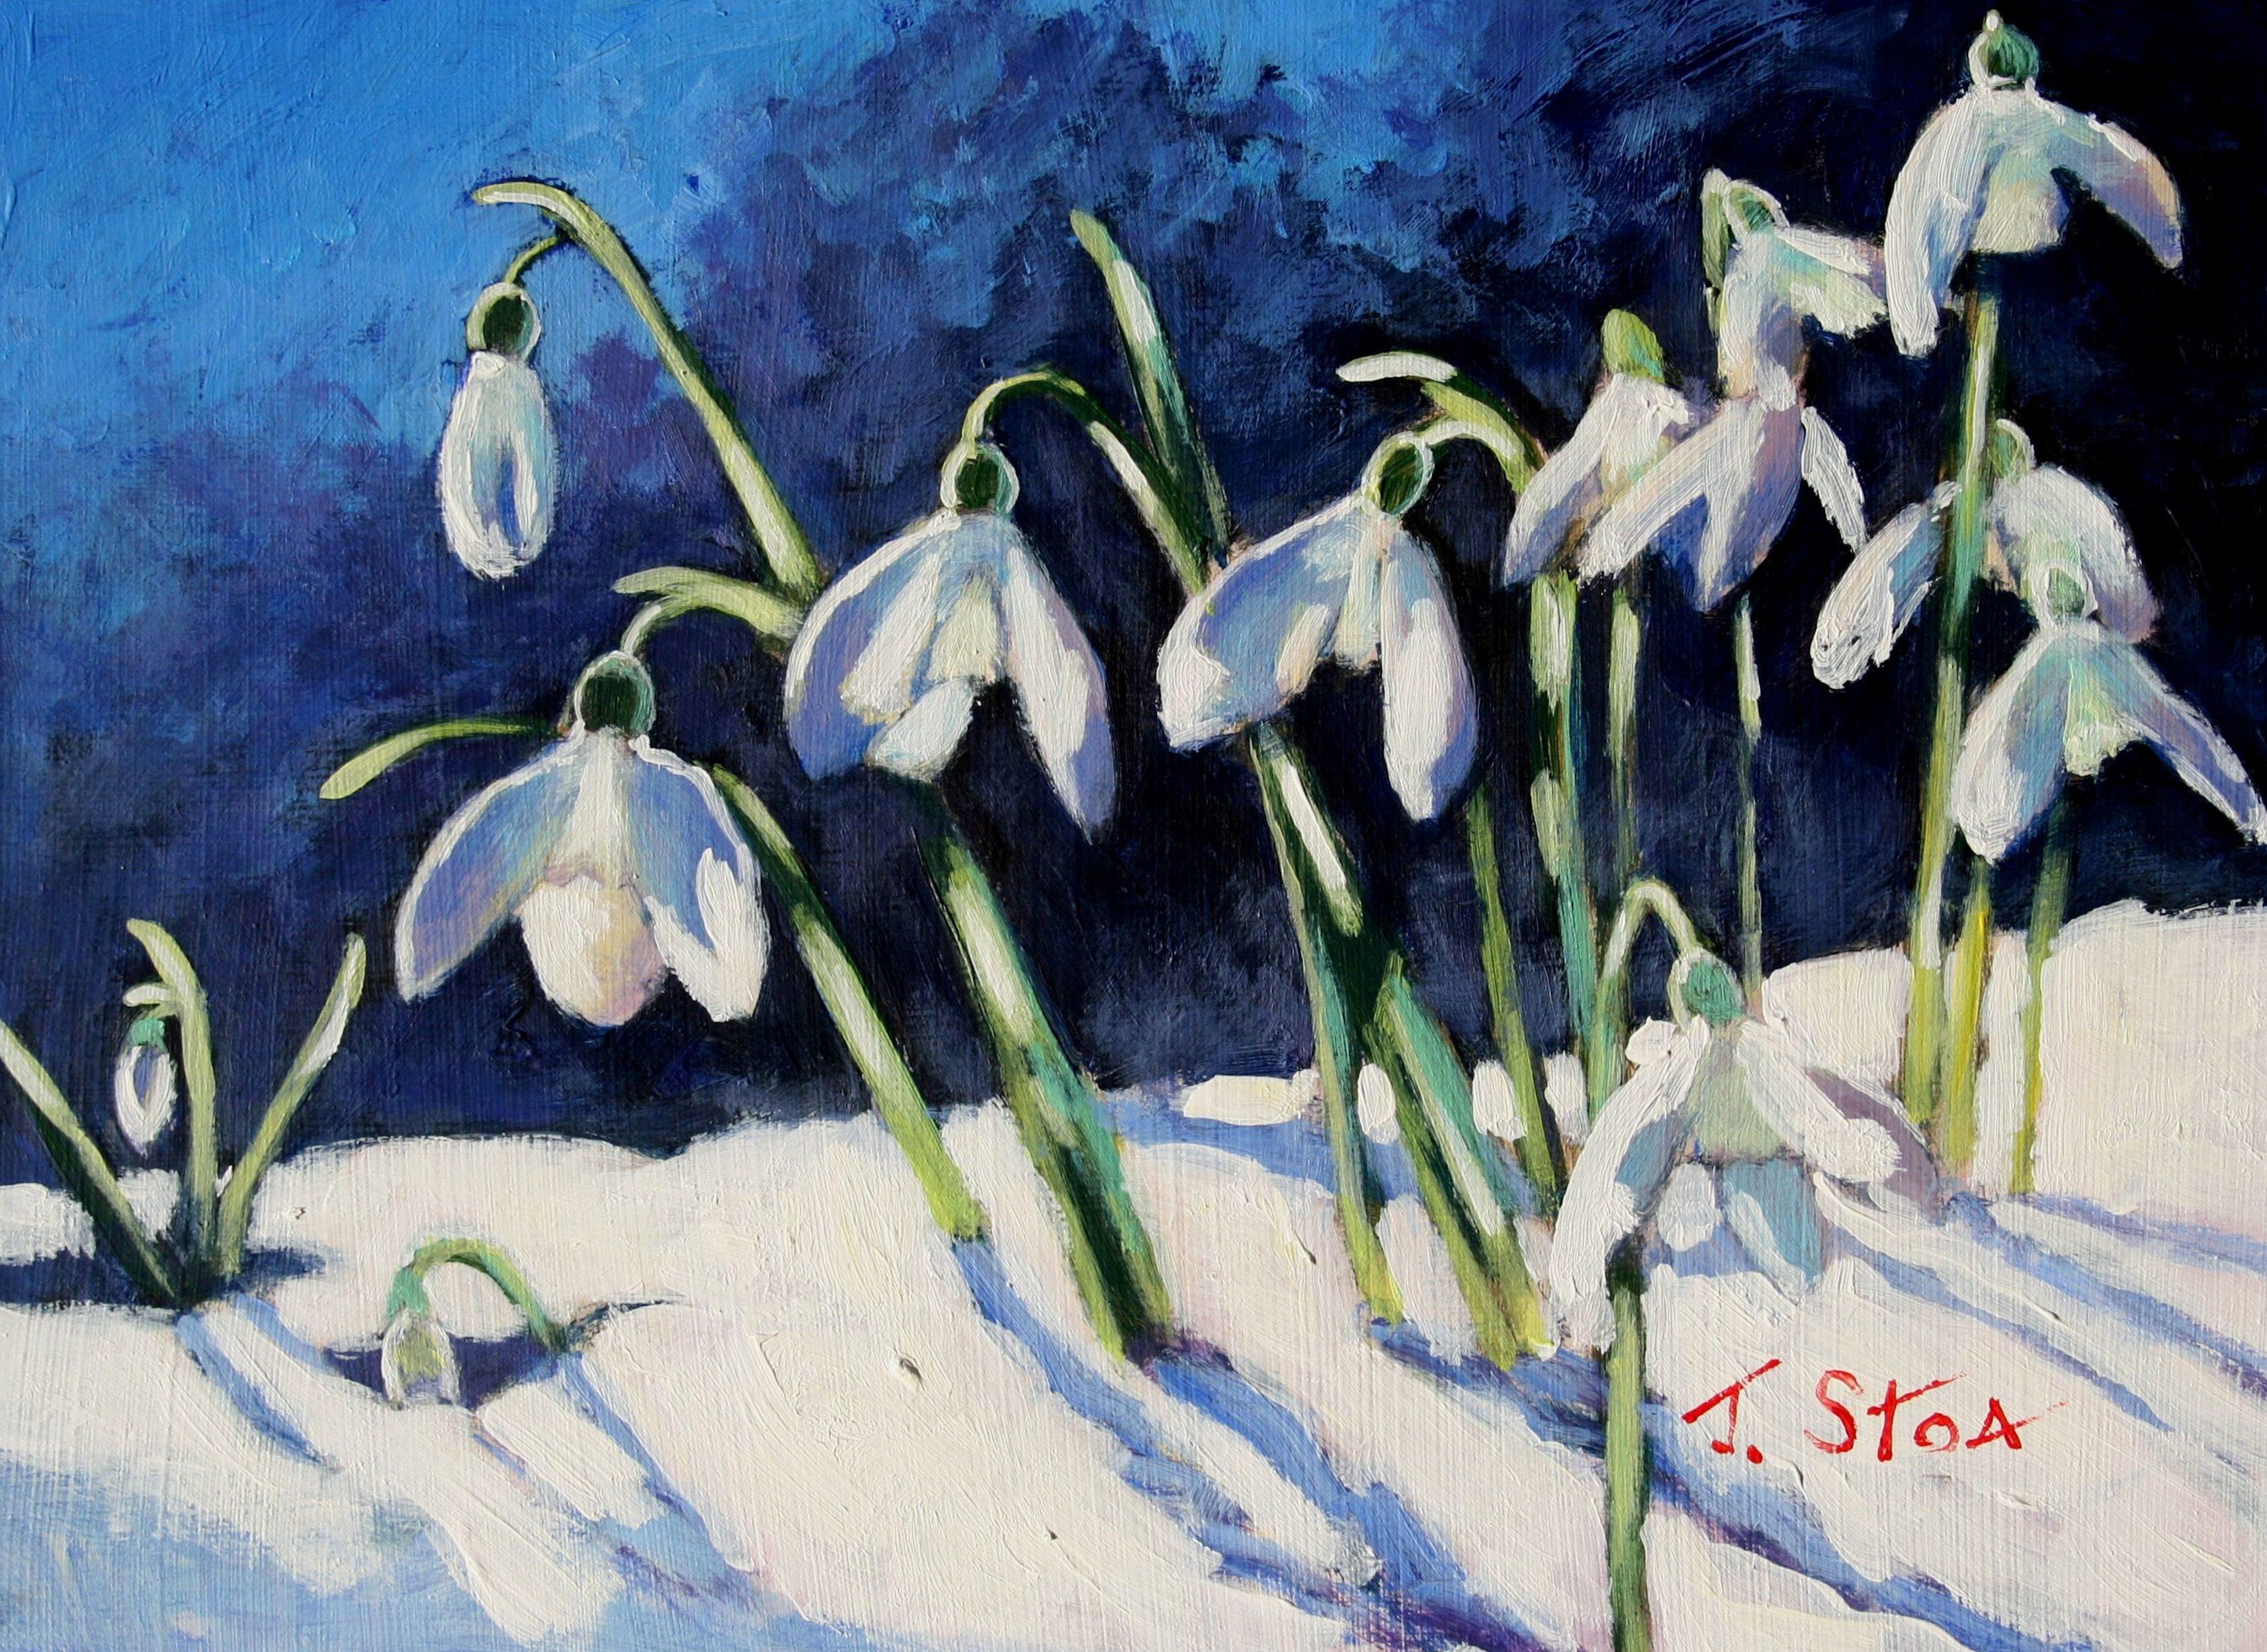 Sunlit Snowdrops